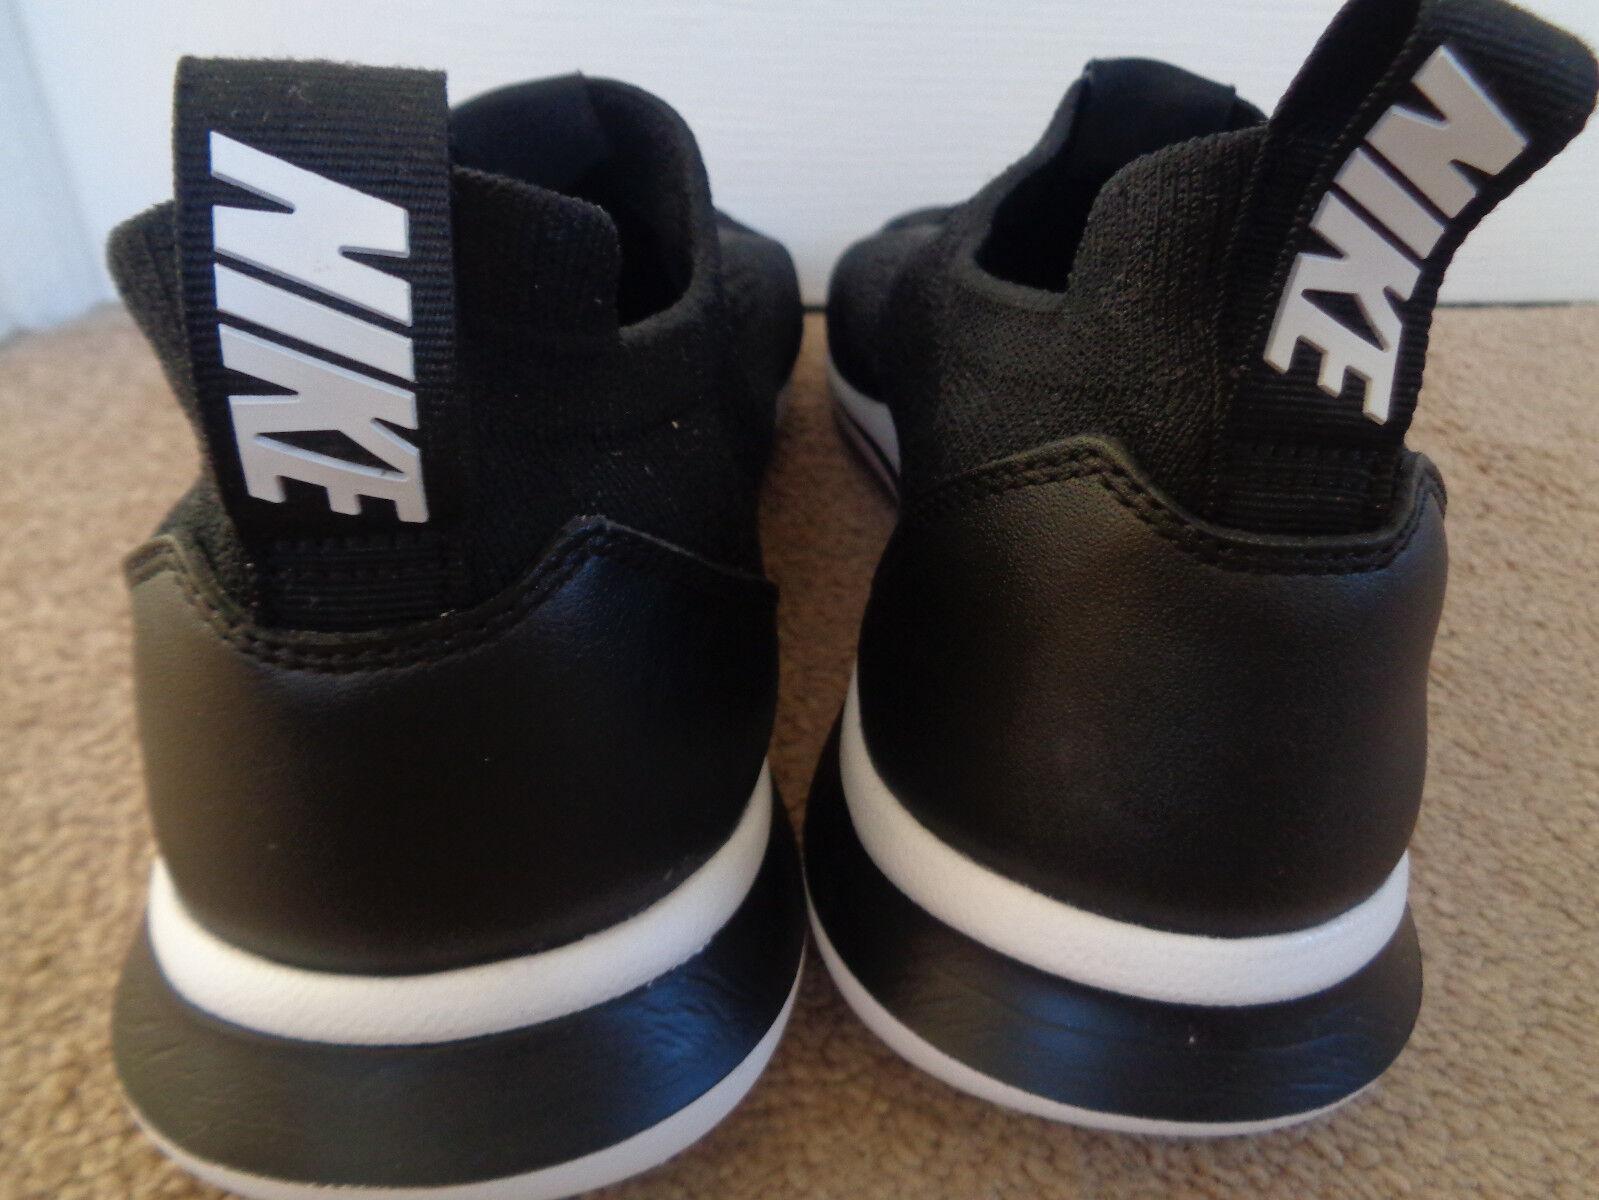 Nike Cortez Flyknit Scarpe da Ginnastica Scarpe da da da Ginnastica AA2029 001 EU 46 US 12 Nuovo + Scatola ea39d8